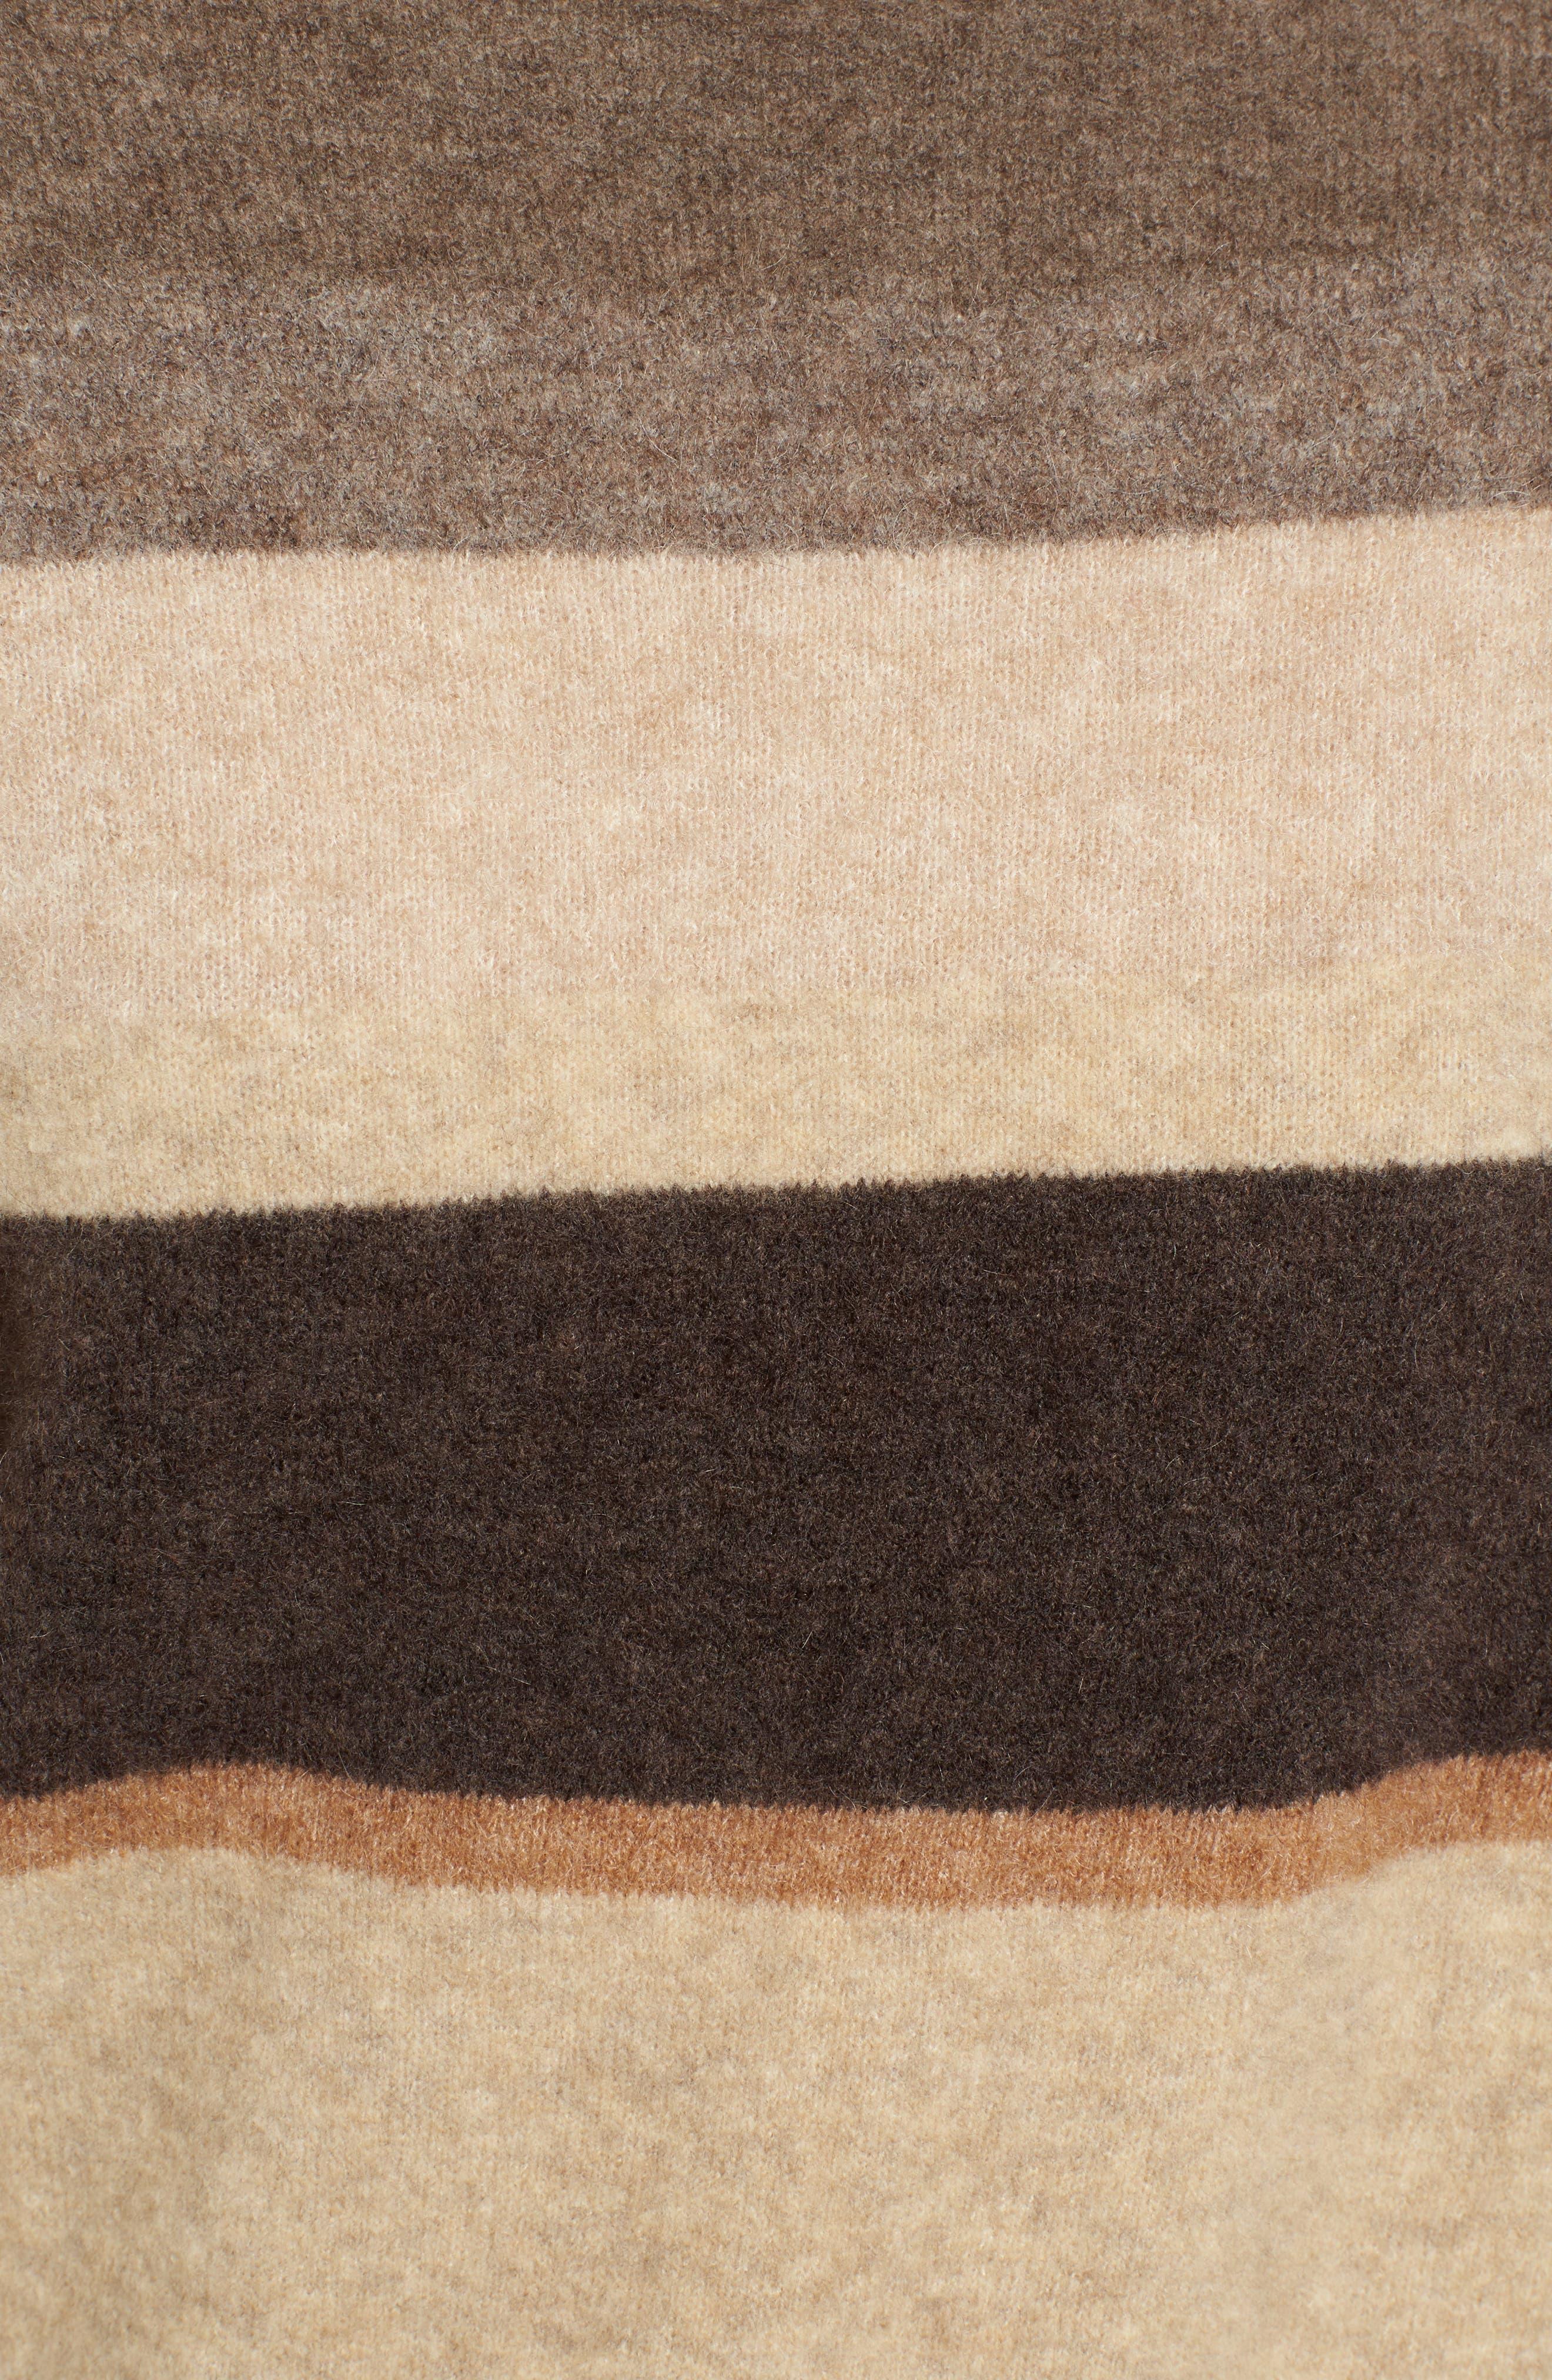 Stripe Sweater,                             Alternate thumbnail 5, color,